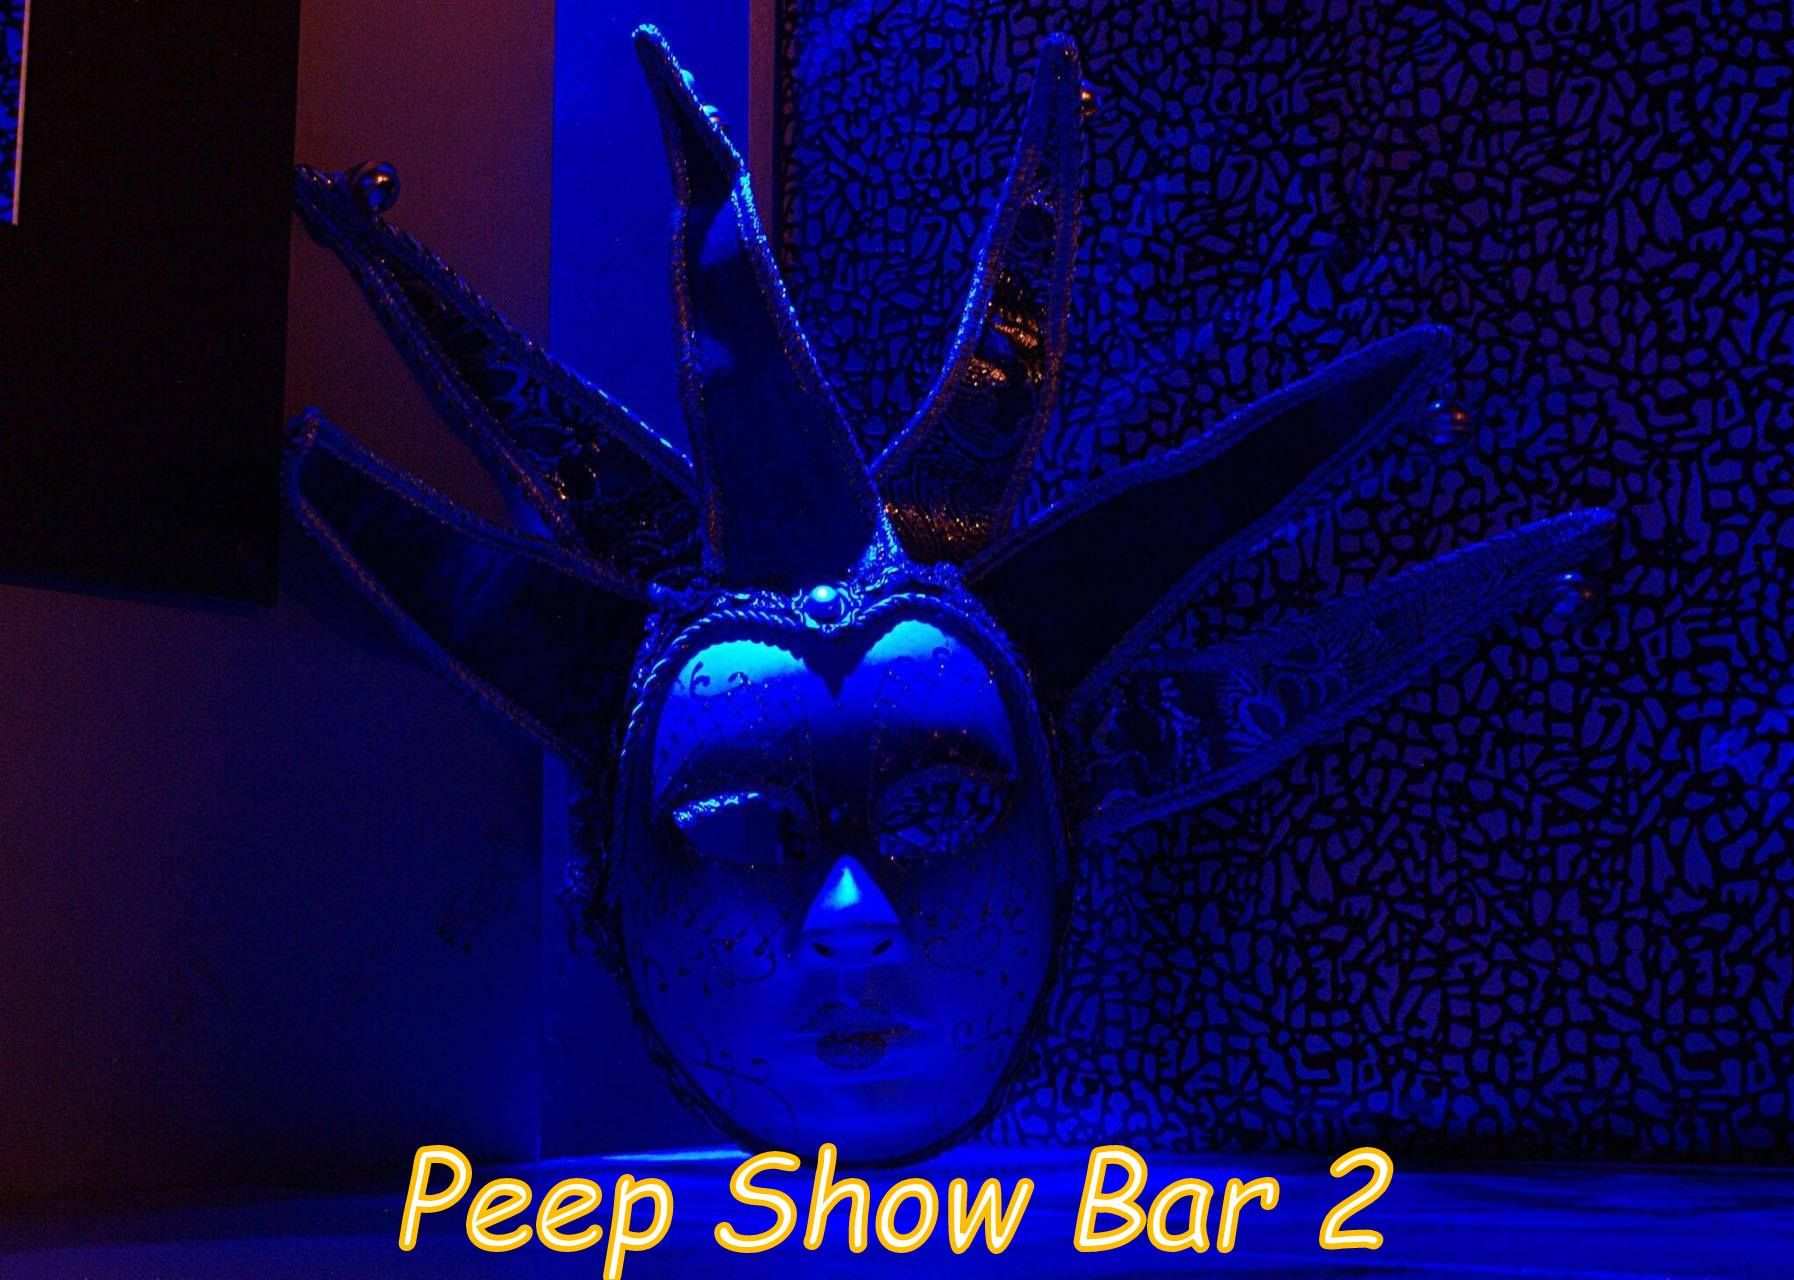 Sofia peep show - Girls - peep show